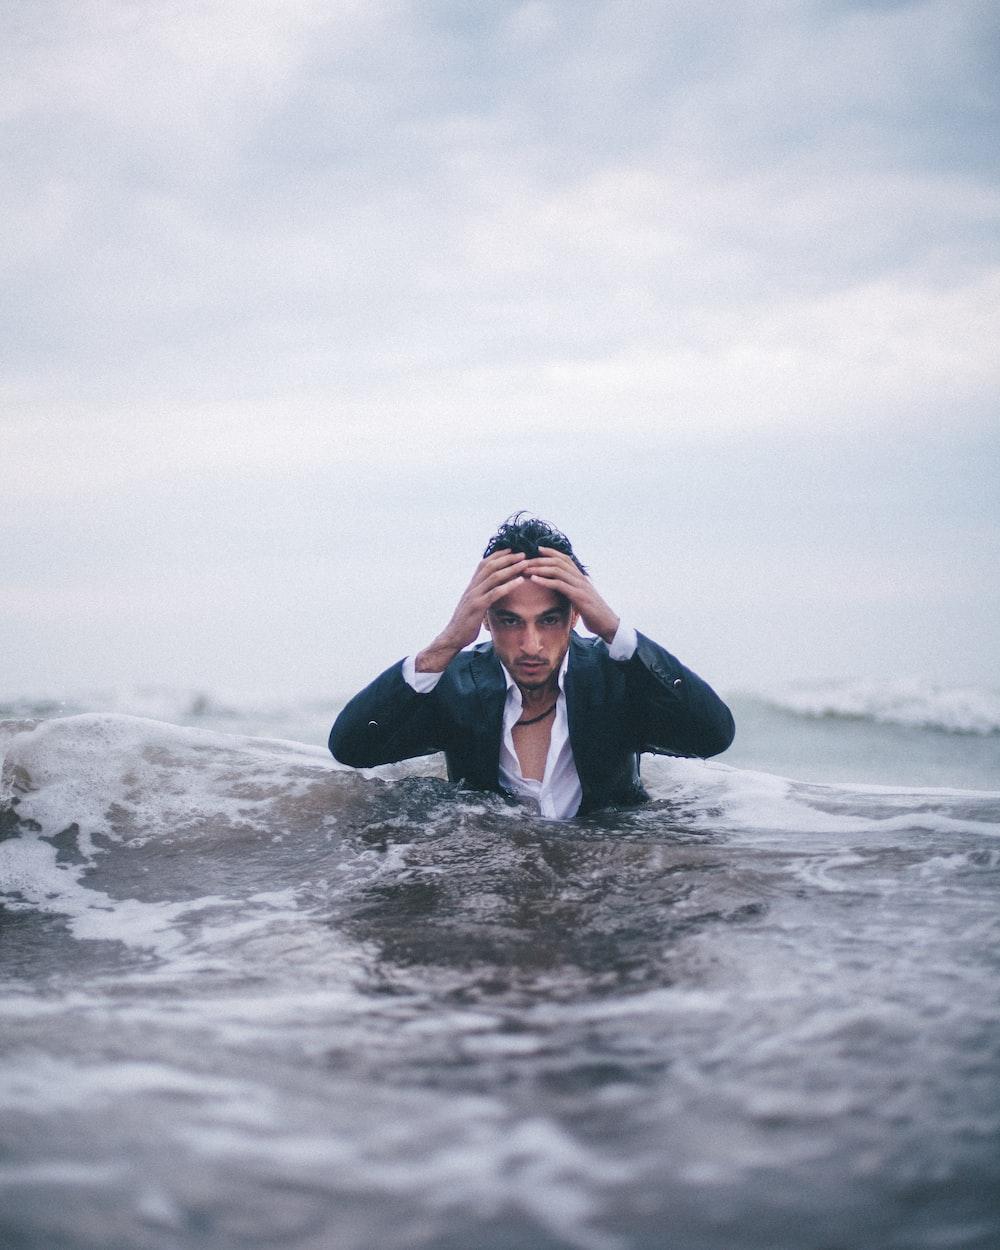 man on body of water during daytime